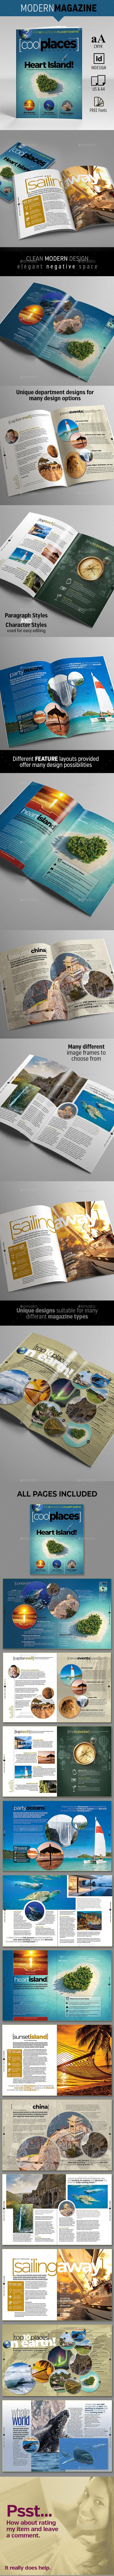 Modern Magazine Template - Magazines Print Templates